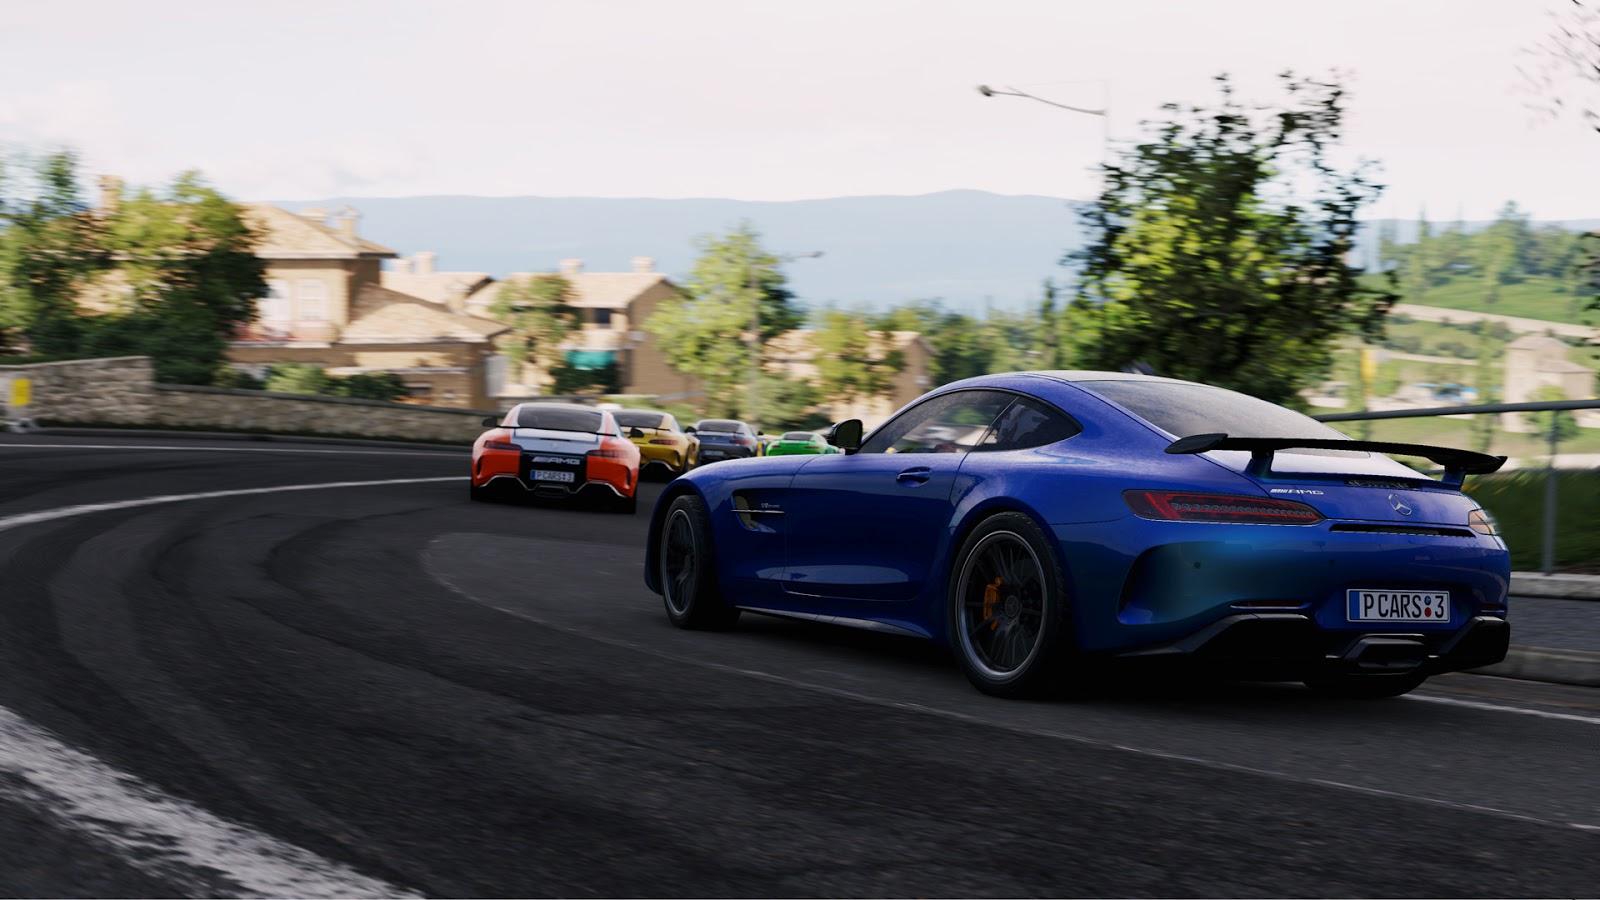 project-cars-3-pc-screenshot-01